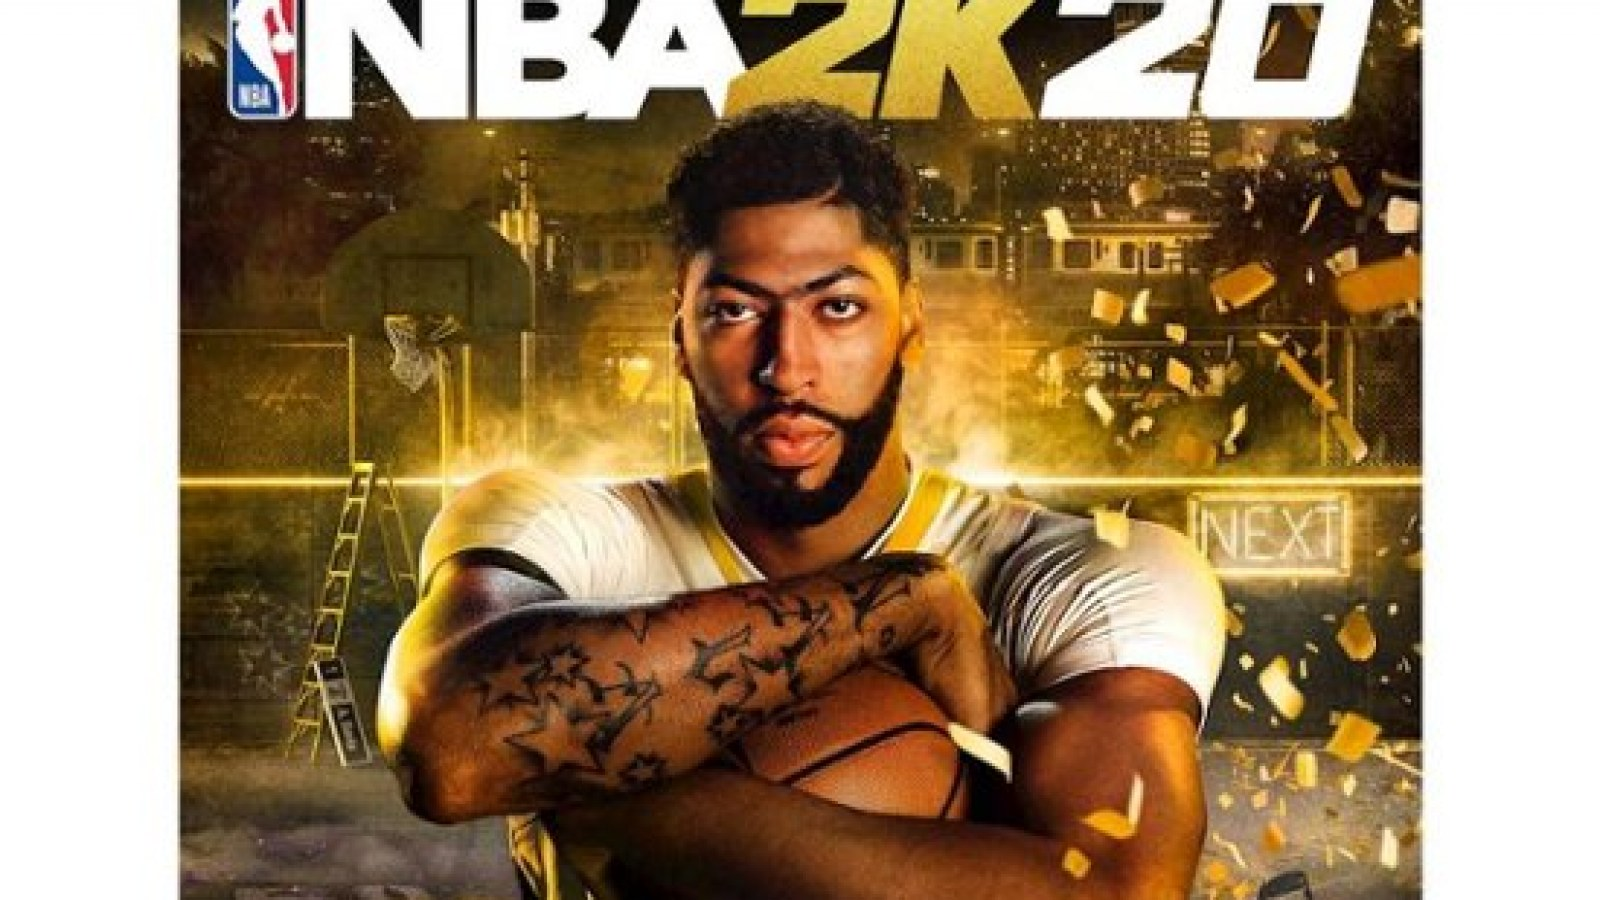 NBA 2K20' Pre-Orders: Bonuses, Editions, Where to Buy and More